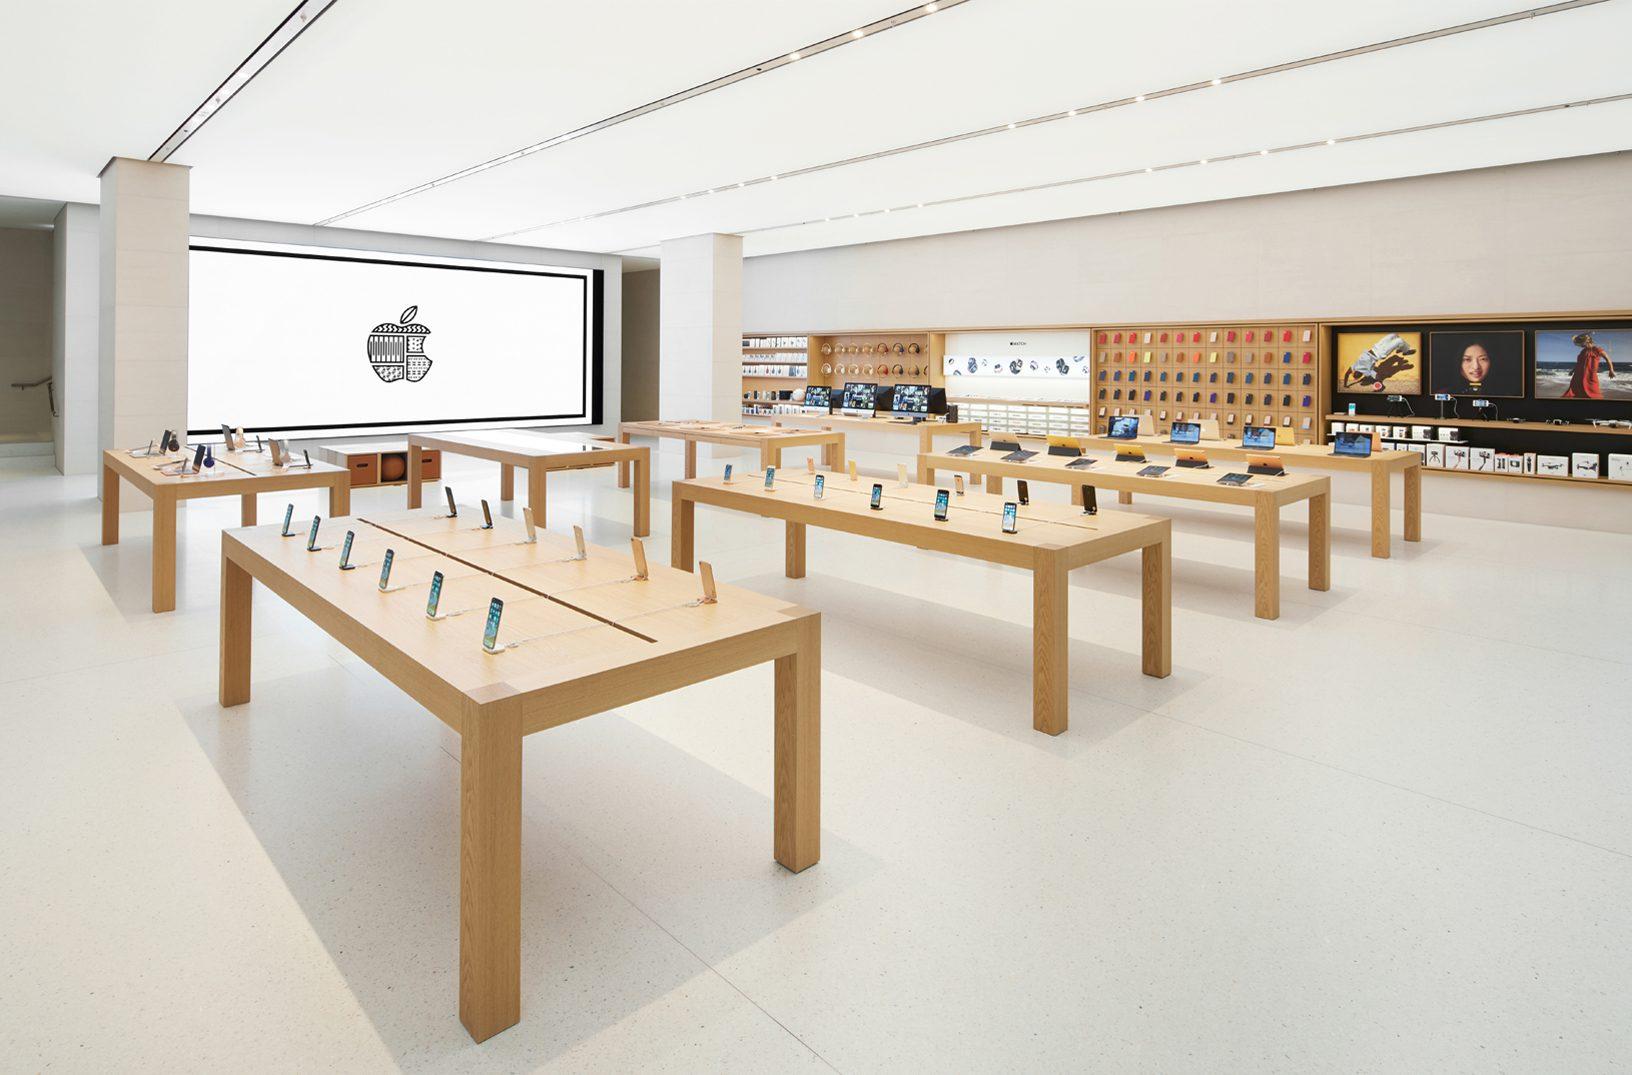 Wenen Apple Store: interieur